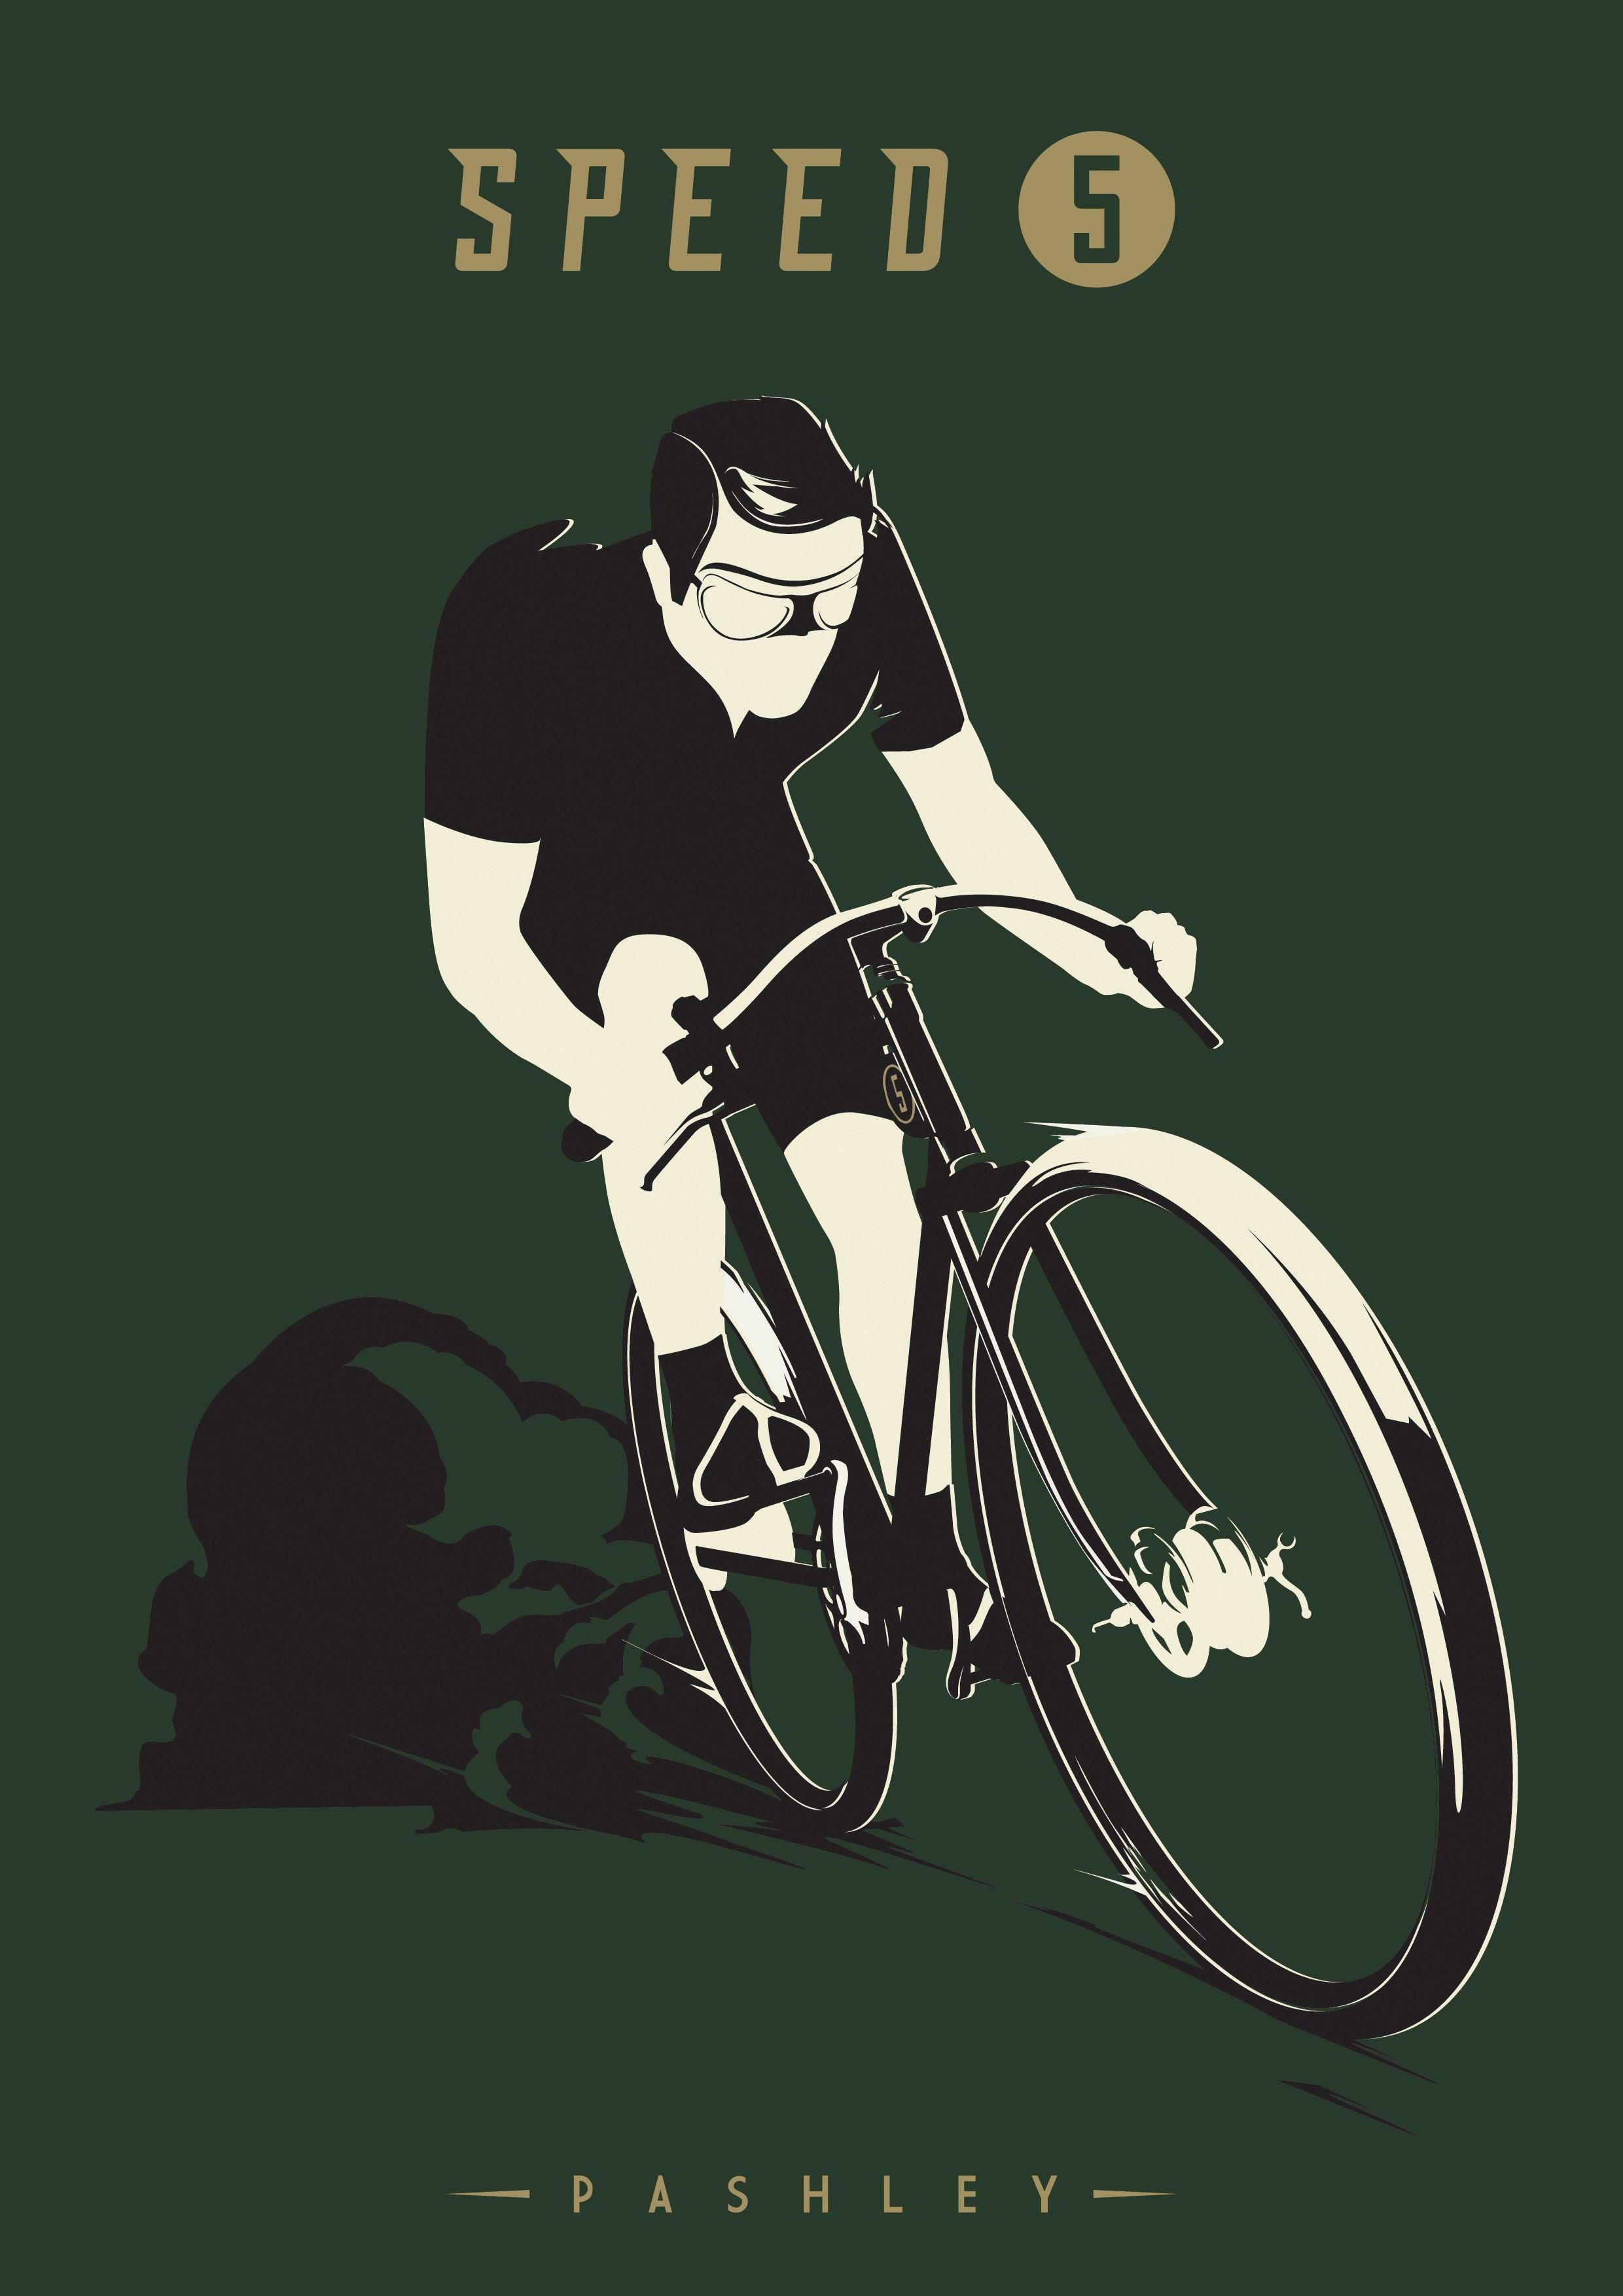 Bicycle Art Kreslene Bike Bicycle A Cycling Art